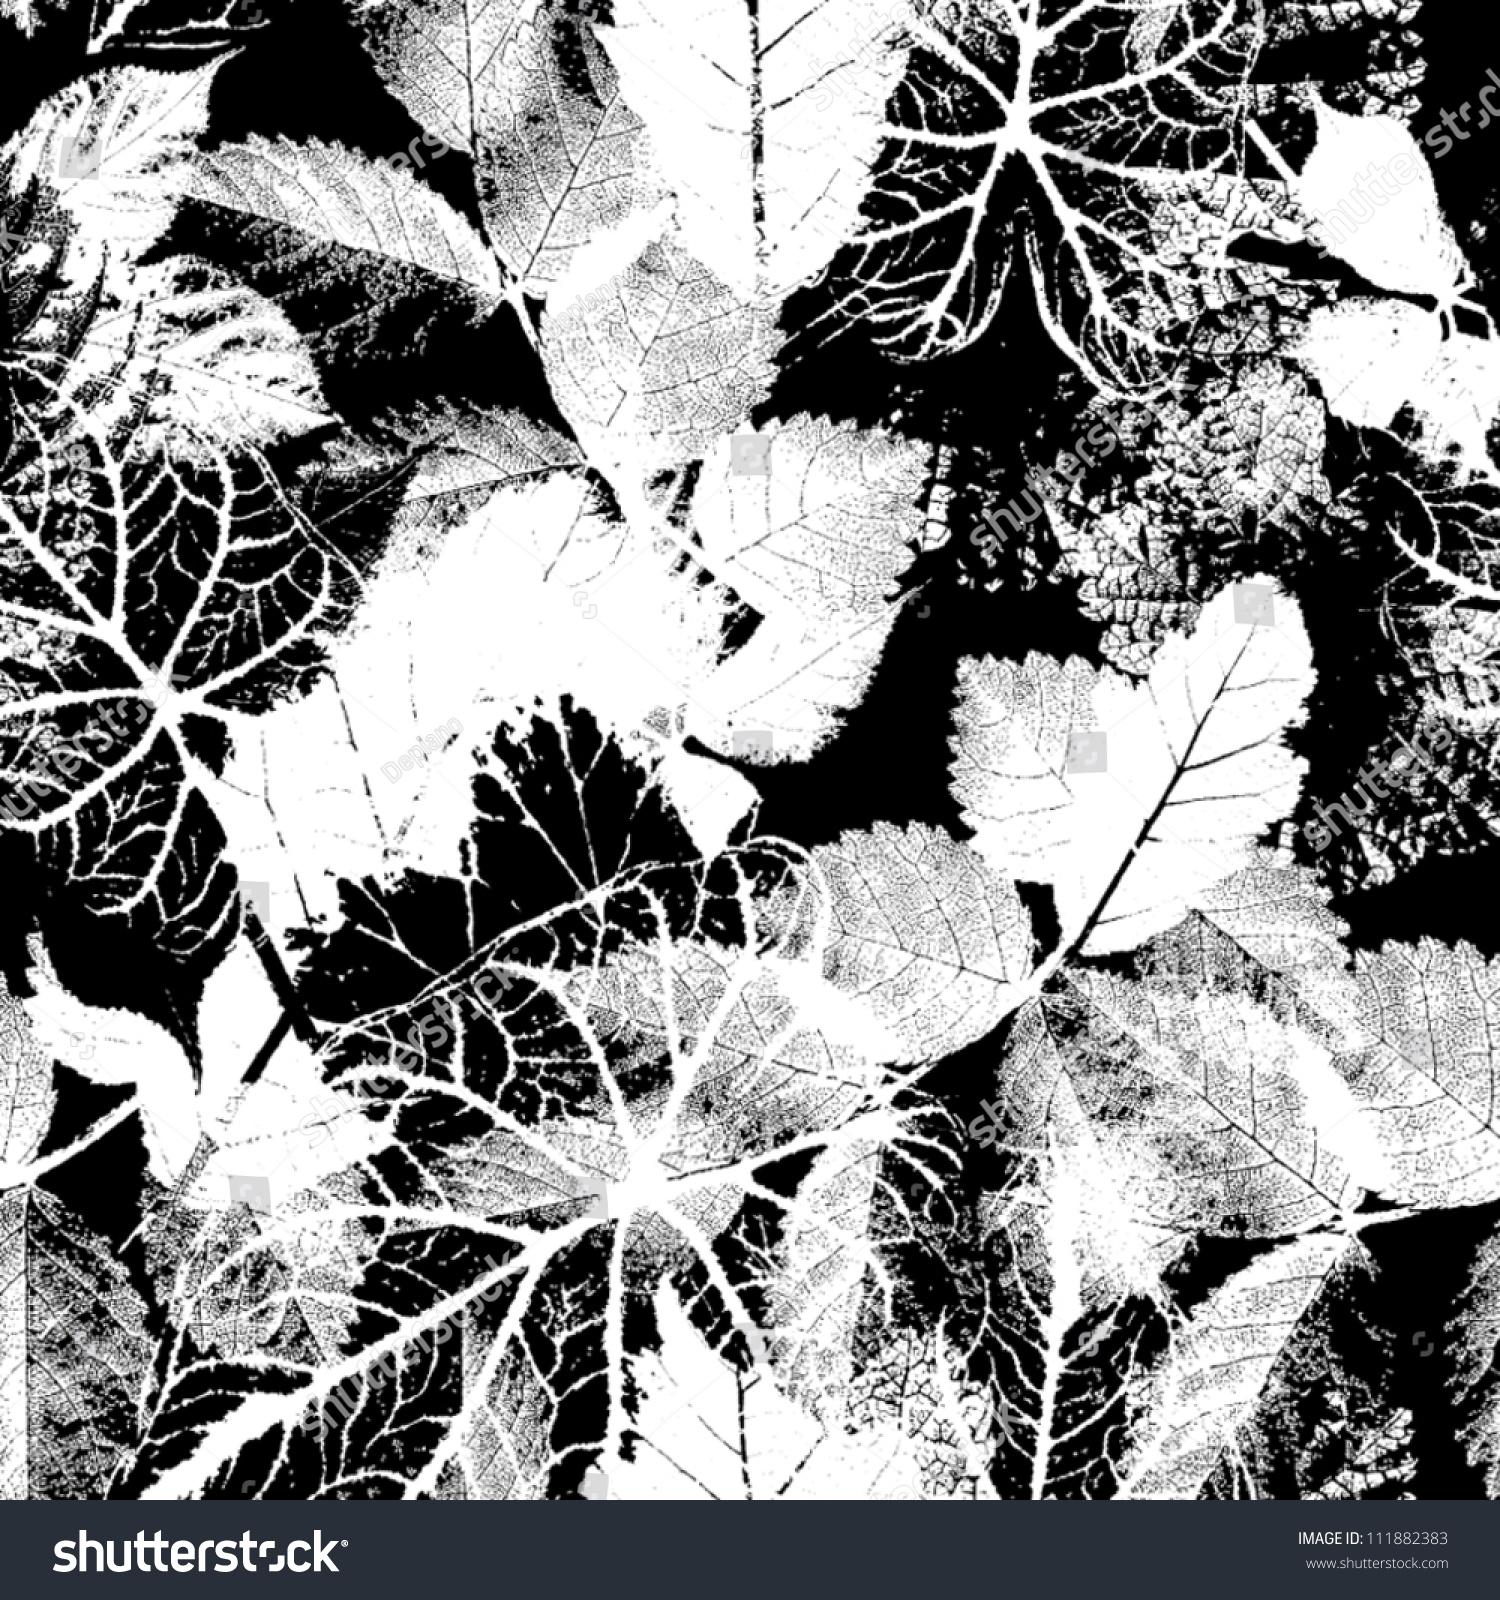 Vector Flower Black White Background Wallpaper: Black White Seamless Pattern Abstract Seamless Stock